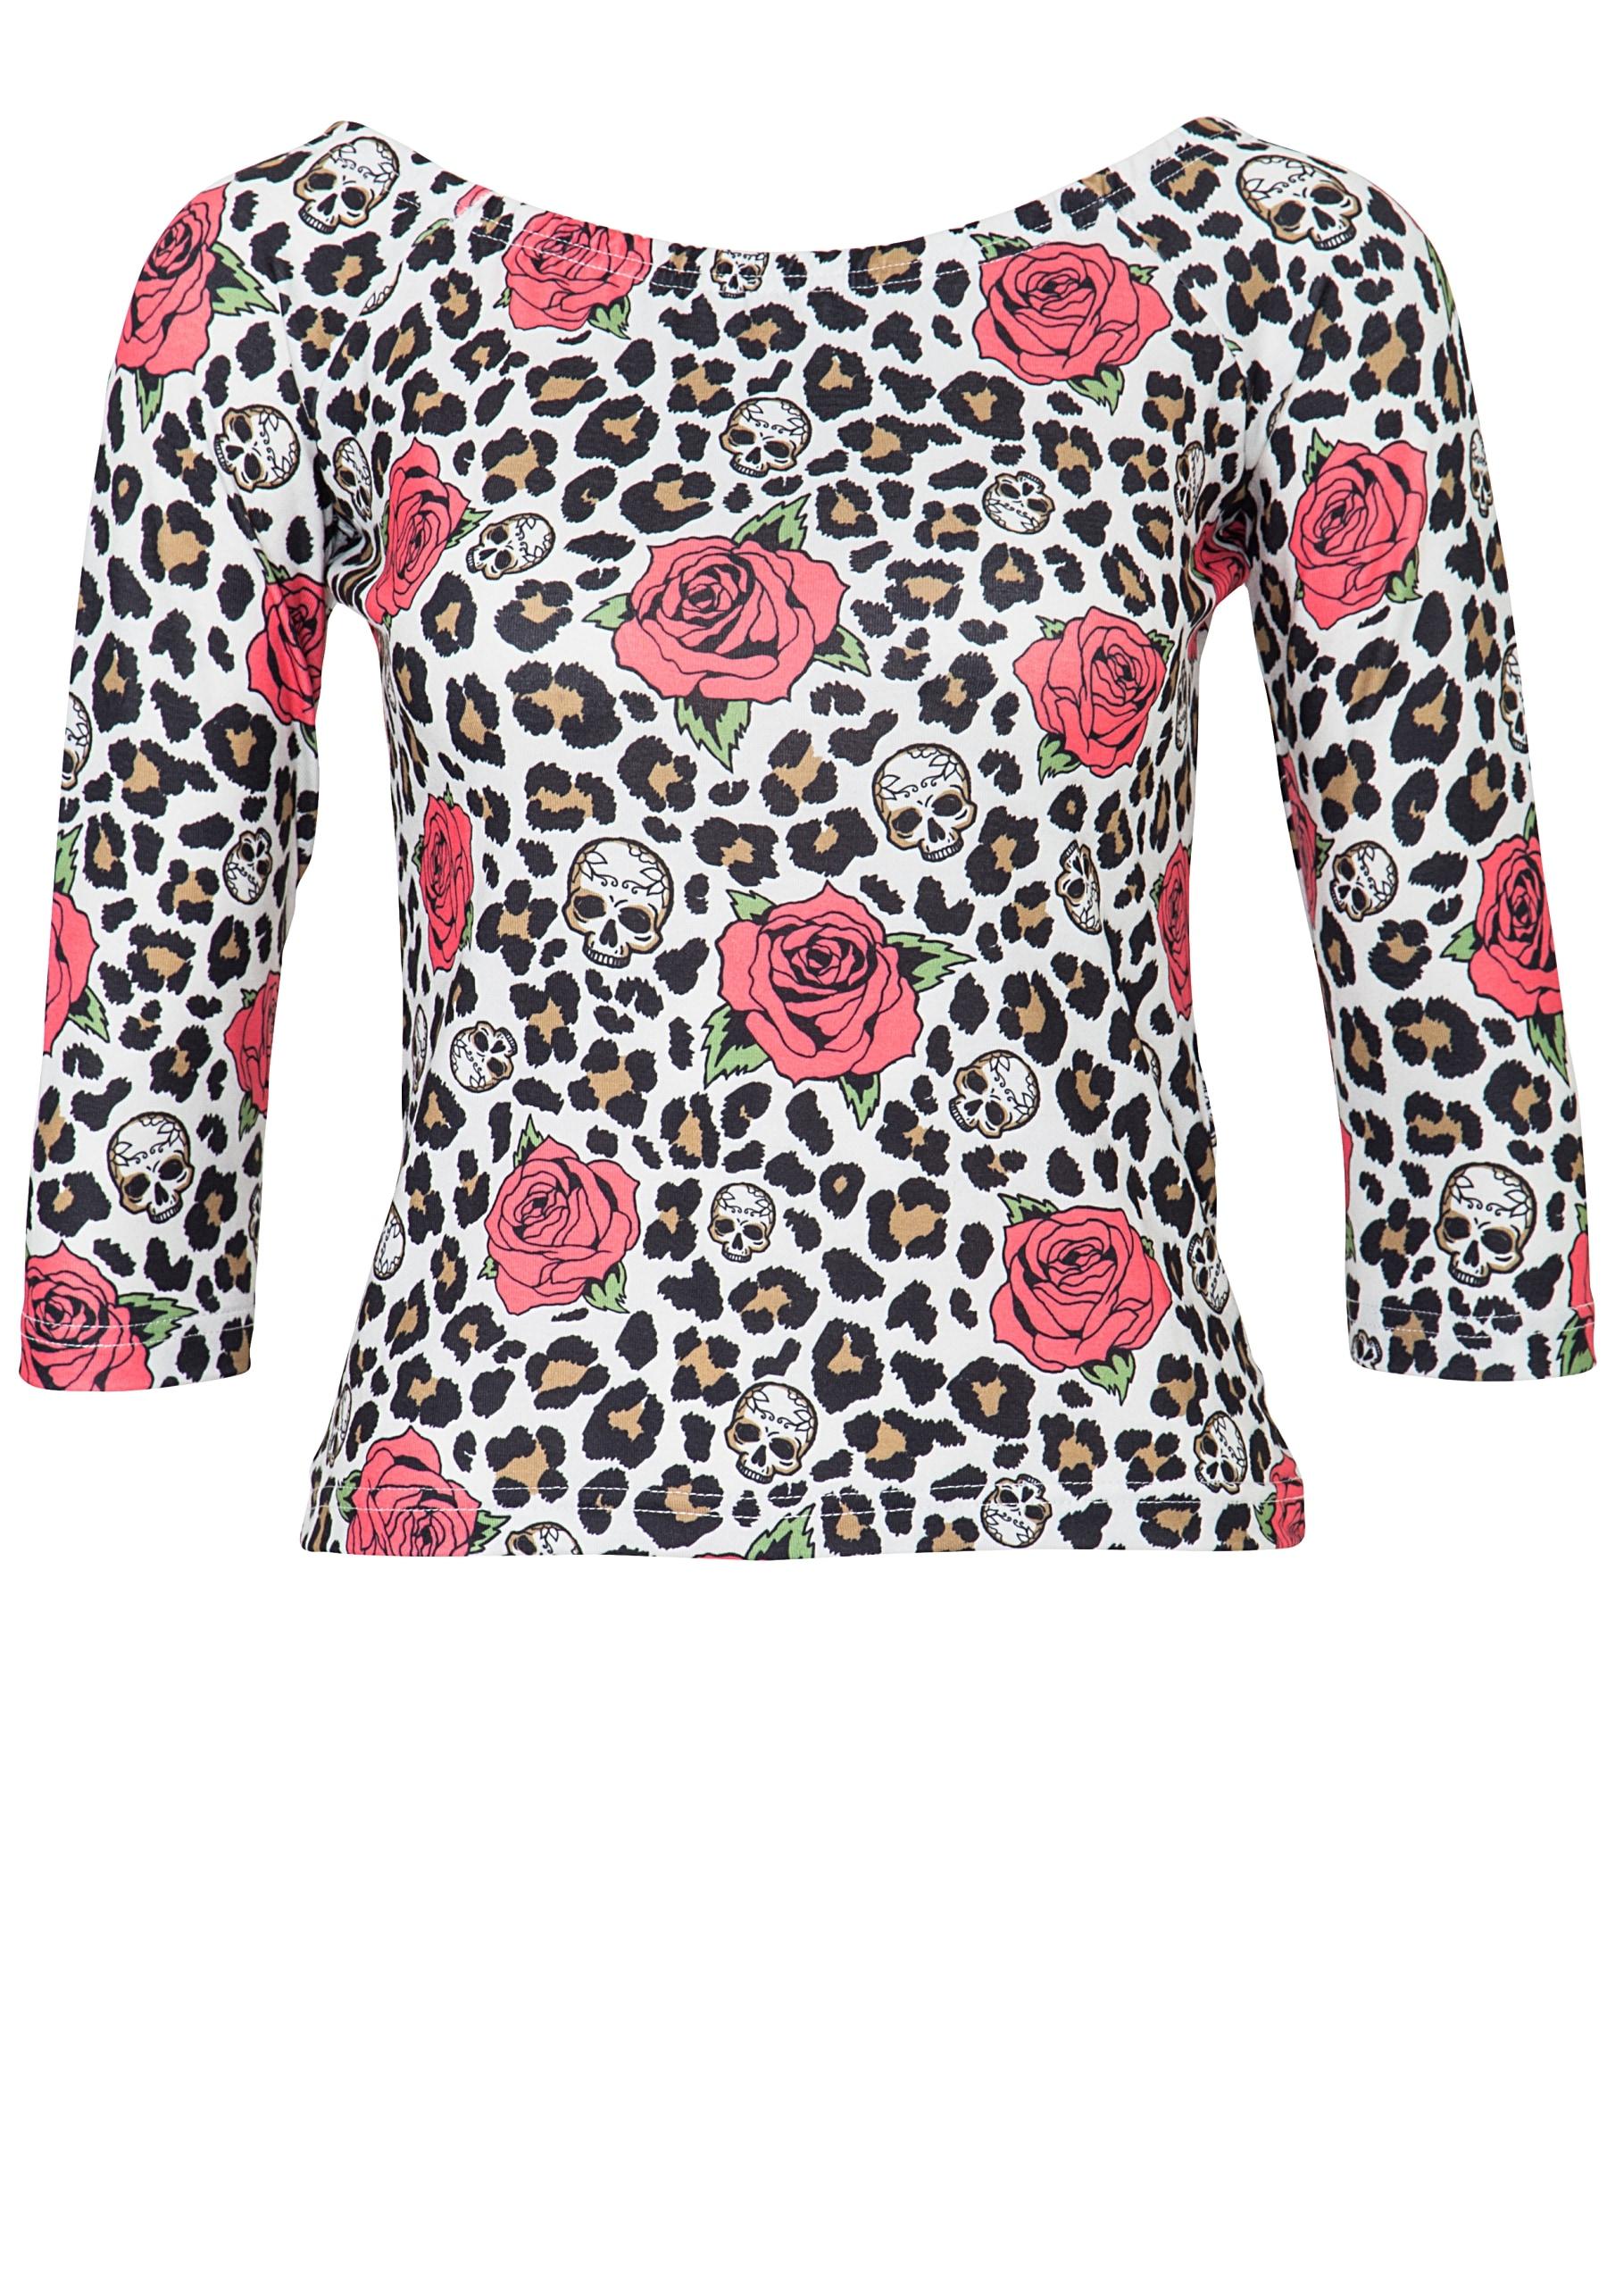 QueenKerosin Carmenshirt Leo & Roses | Bekleidung > Shirts > Carmenshirts & Wasserfallshirts | Weiß | Queenkerosin